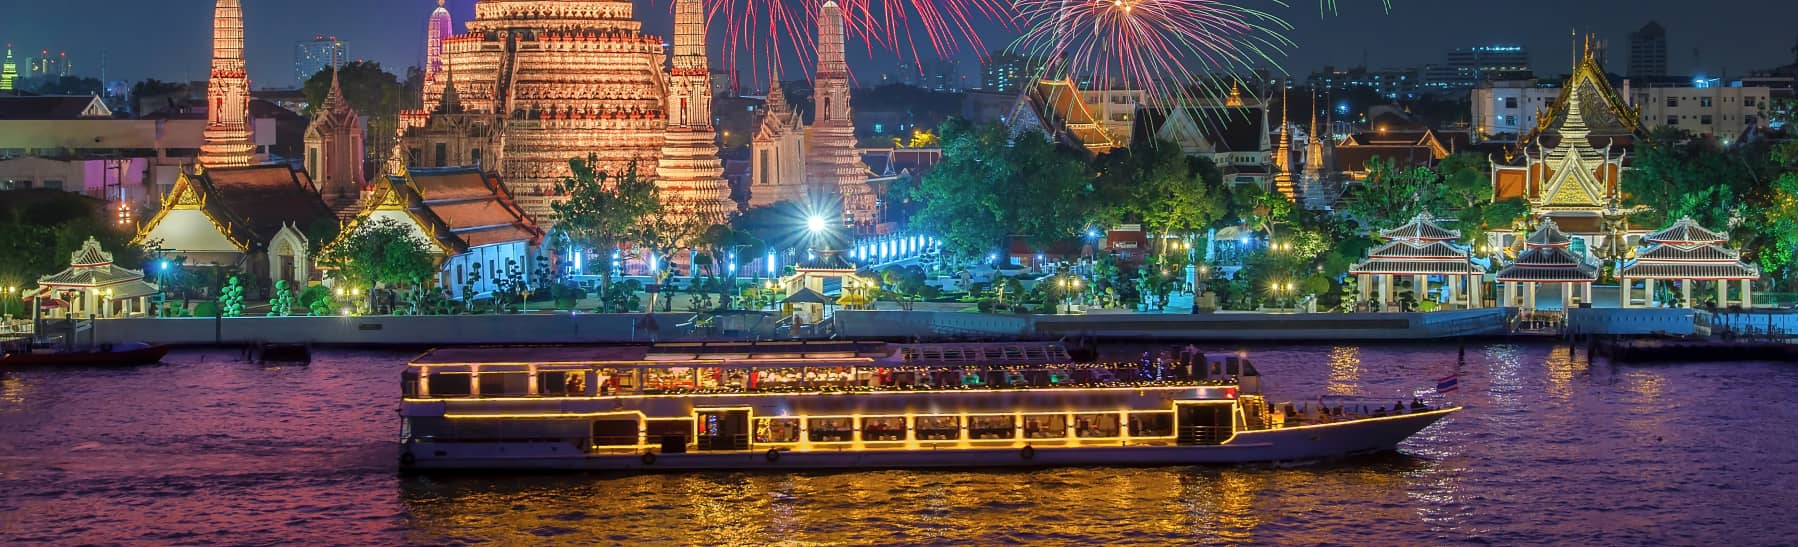 Chao Phraya Princess Dinner Cruise Bangkok — Half Day gallery